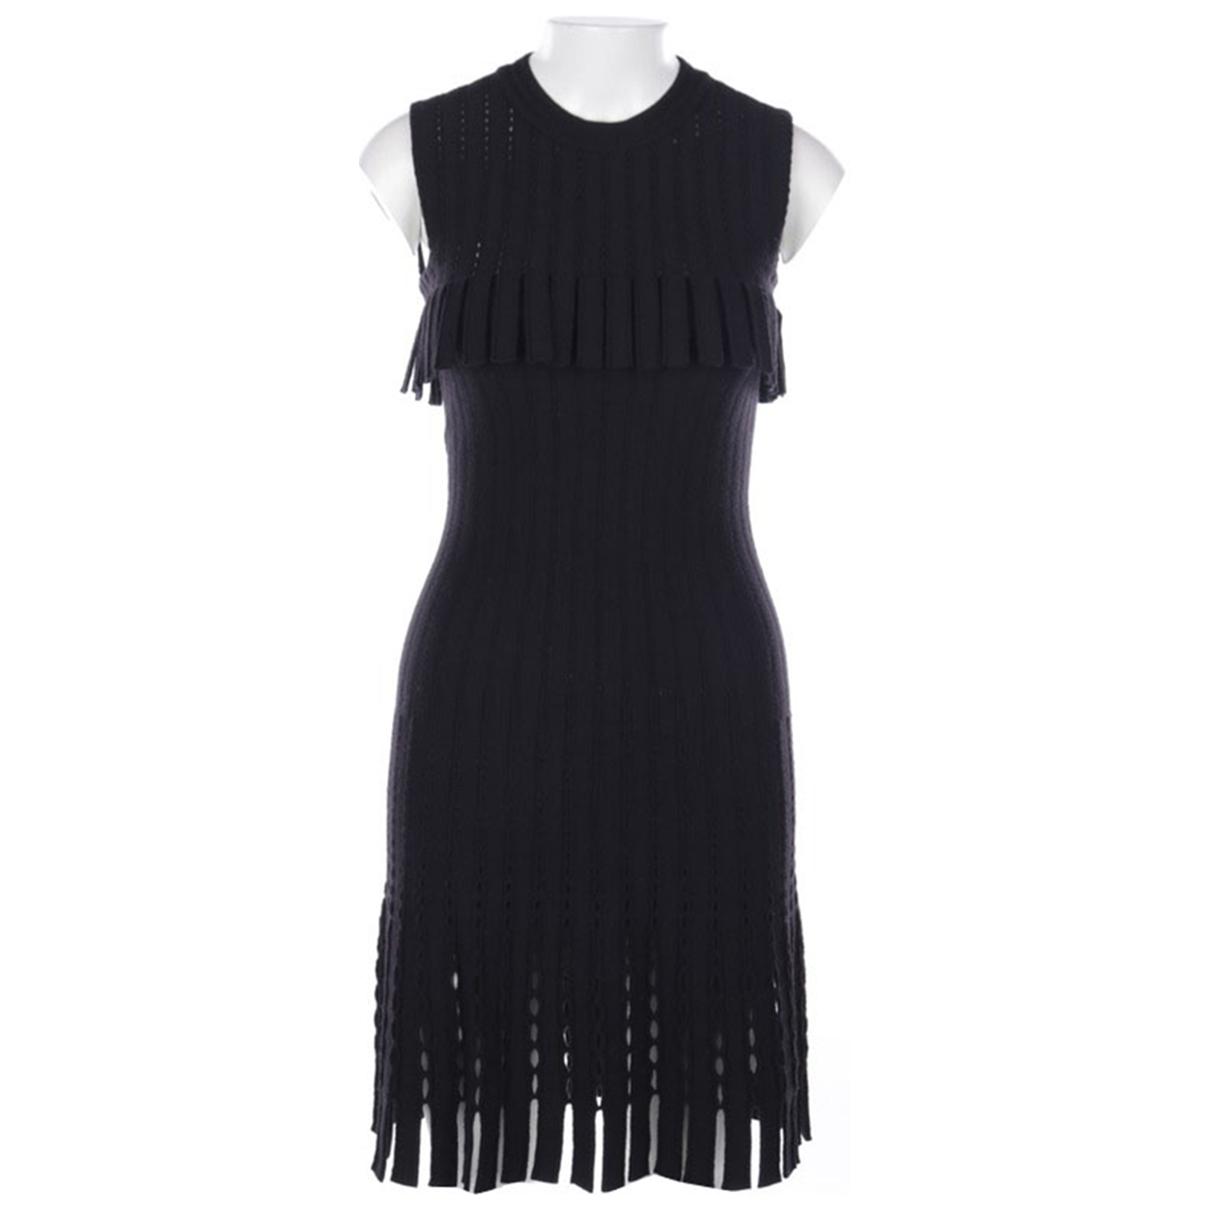 Alaïa \N Black Wool dress for Women 36 FR